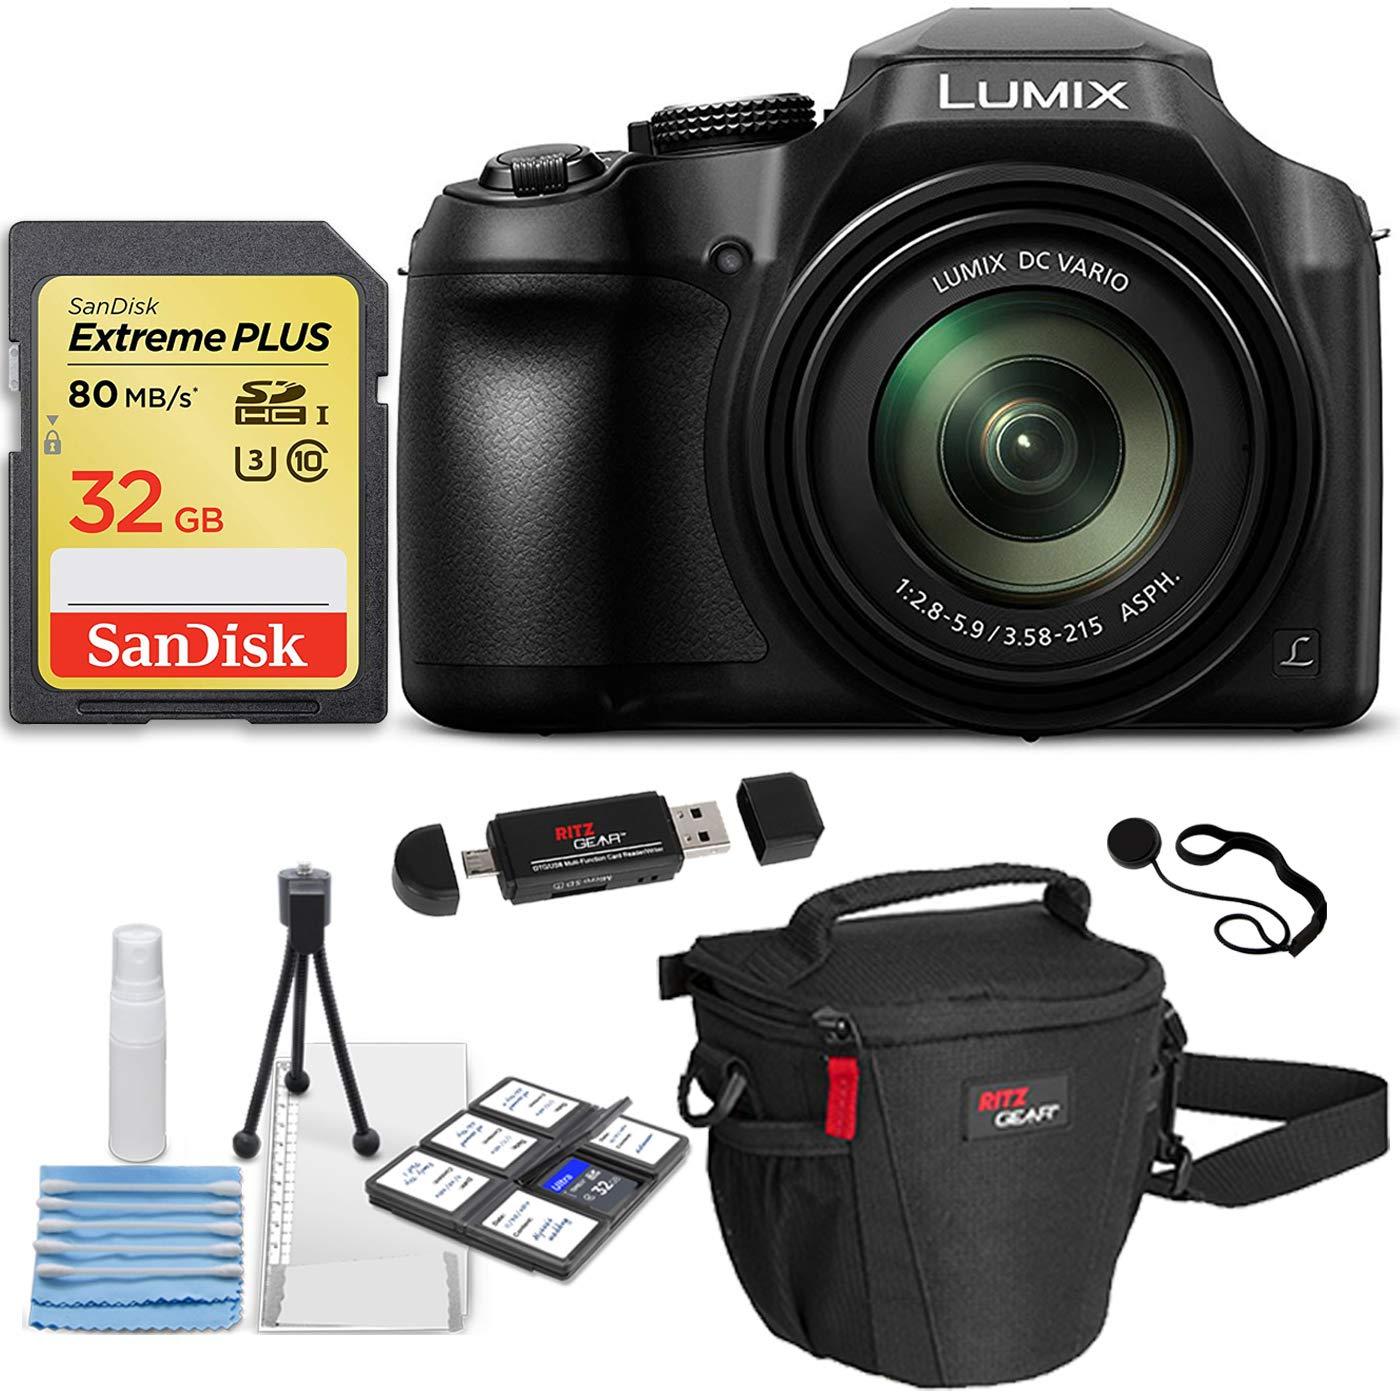 Panasonic Lumix DC-FZ80 Digital Camera, Sandisk Ultra 16GB SDHC 2 Pack Bulk Memory Cards, Ritz Gear Camera Bag, Cleaning Kit and Accessory Bundle